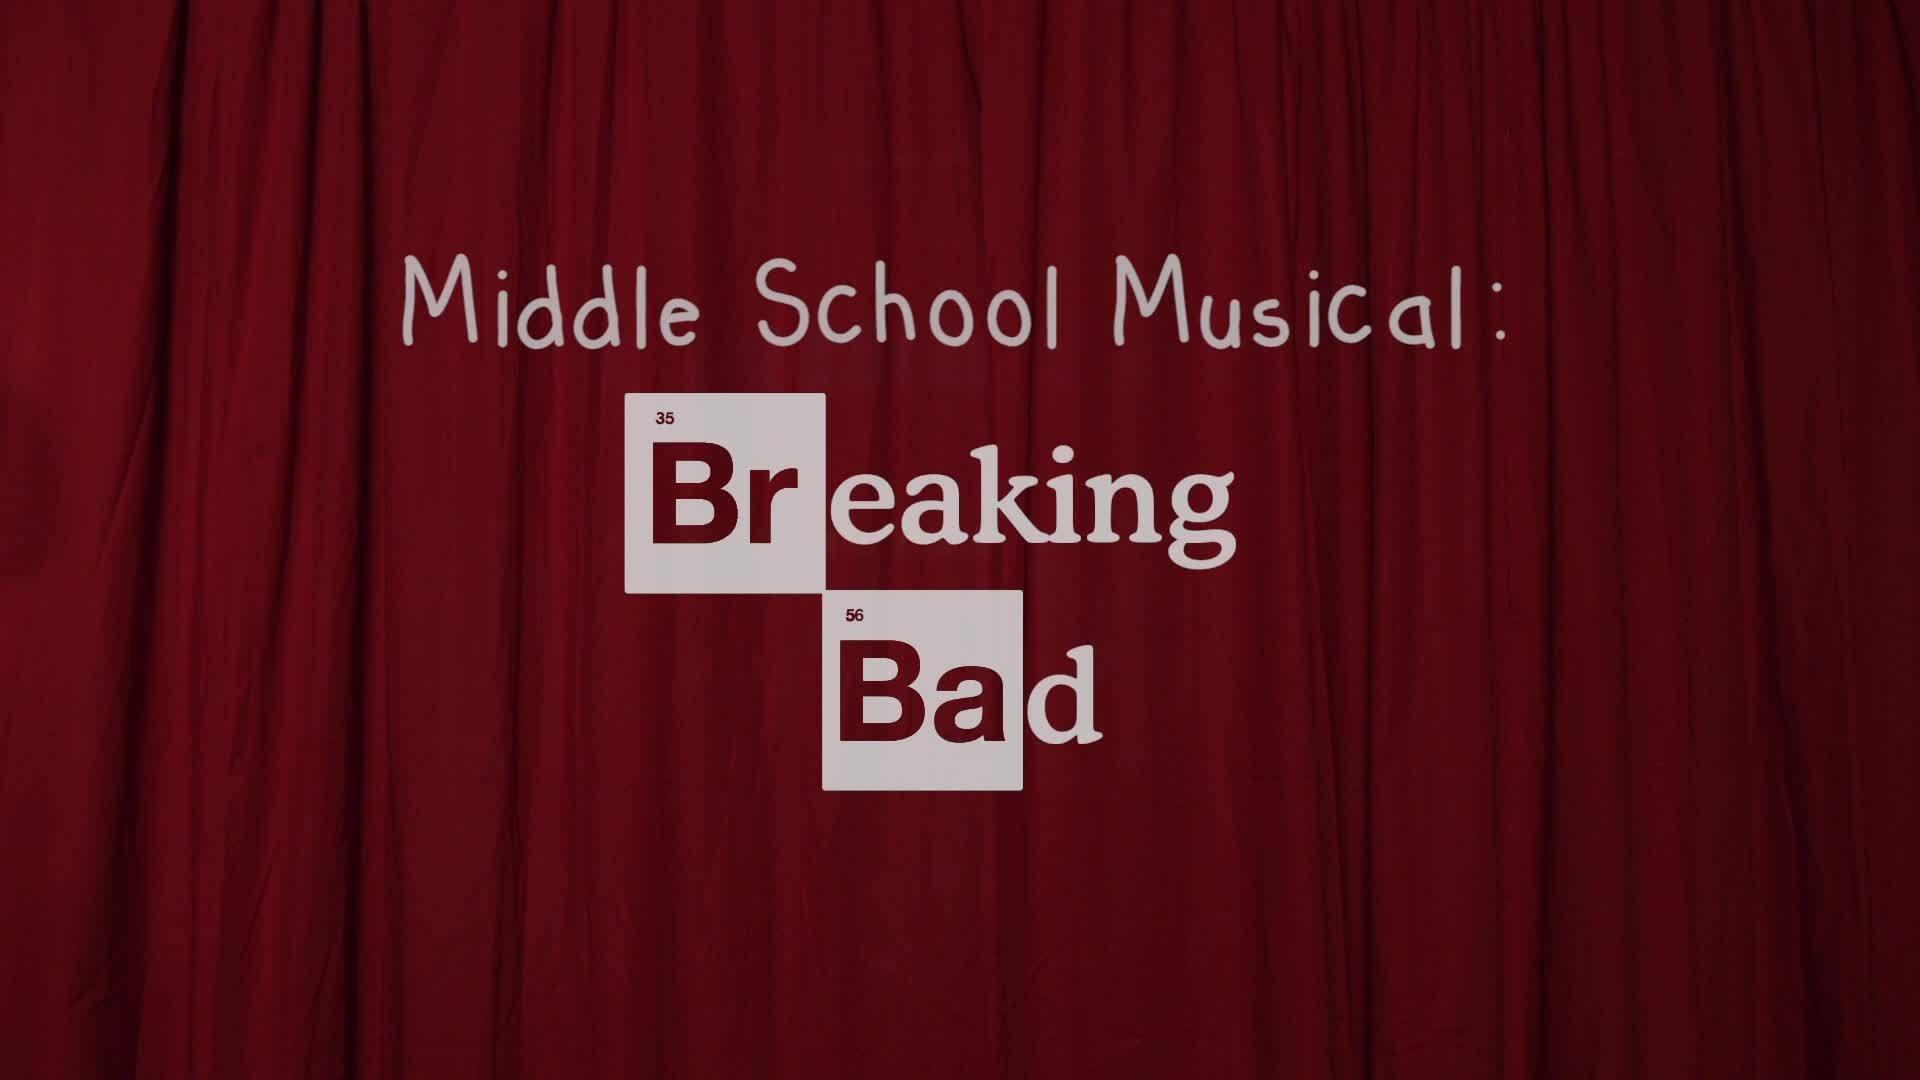 2014 Webby Winner - Breaking Bad: The Middle School Musical